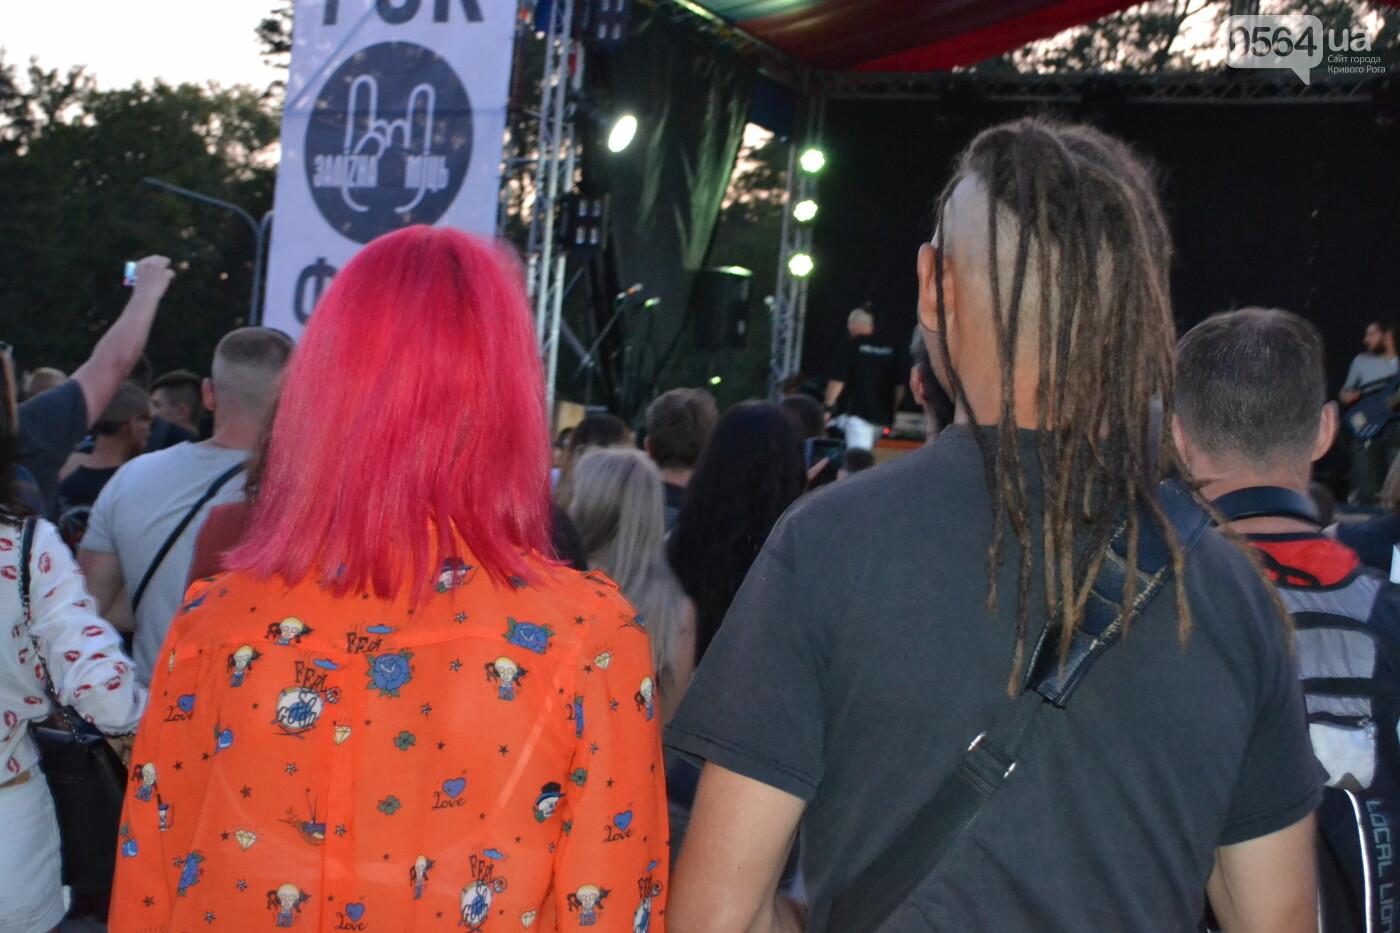 "Hairstyles рок-фестиваля: ""ЗаліZна міць"" собрала криворожан с ярко выраженной индивидуальностью, - ФОТО, фото-7"